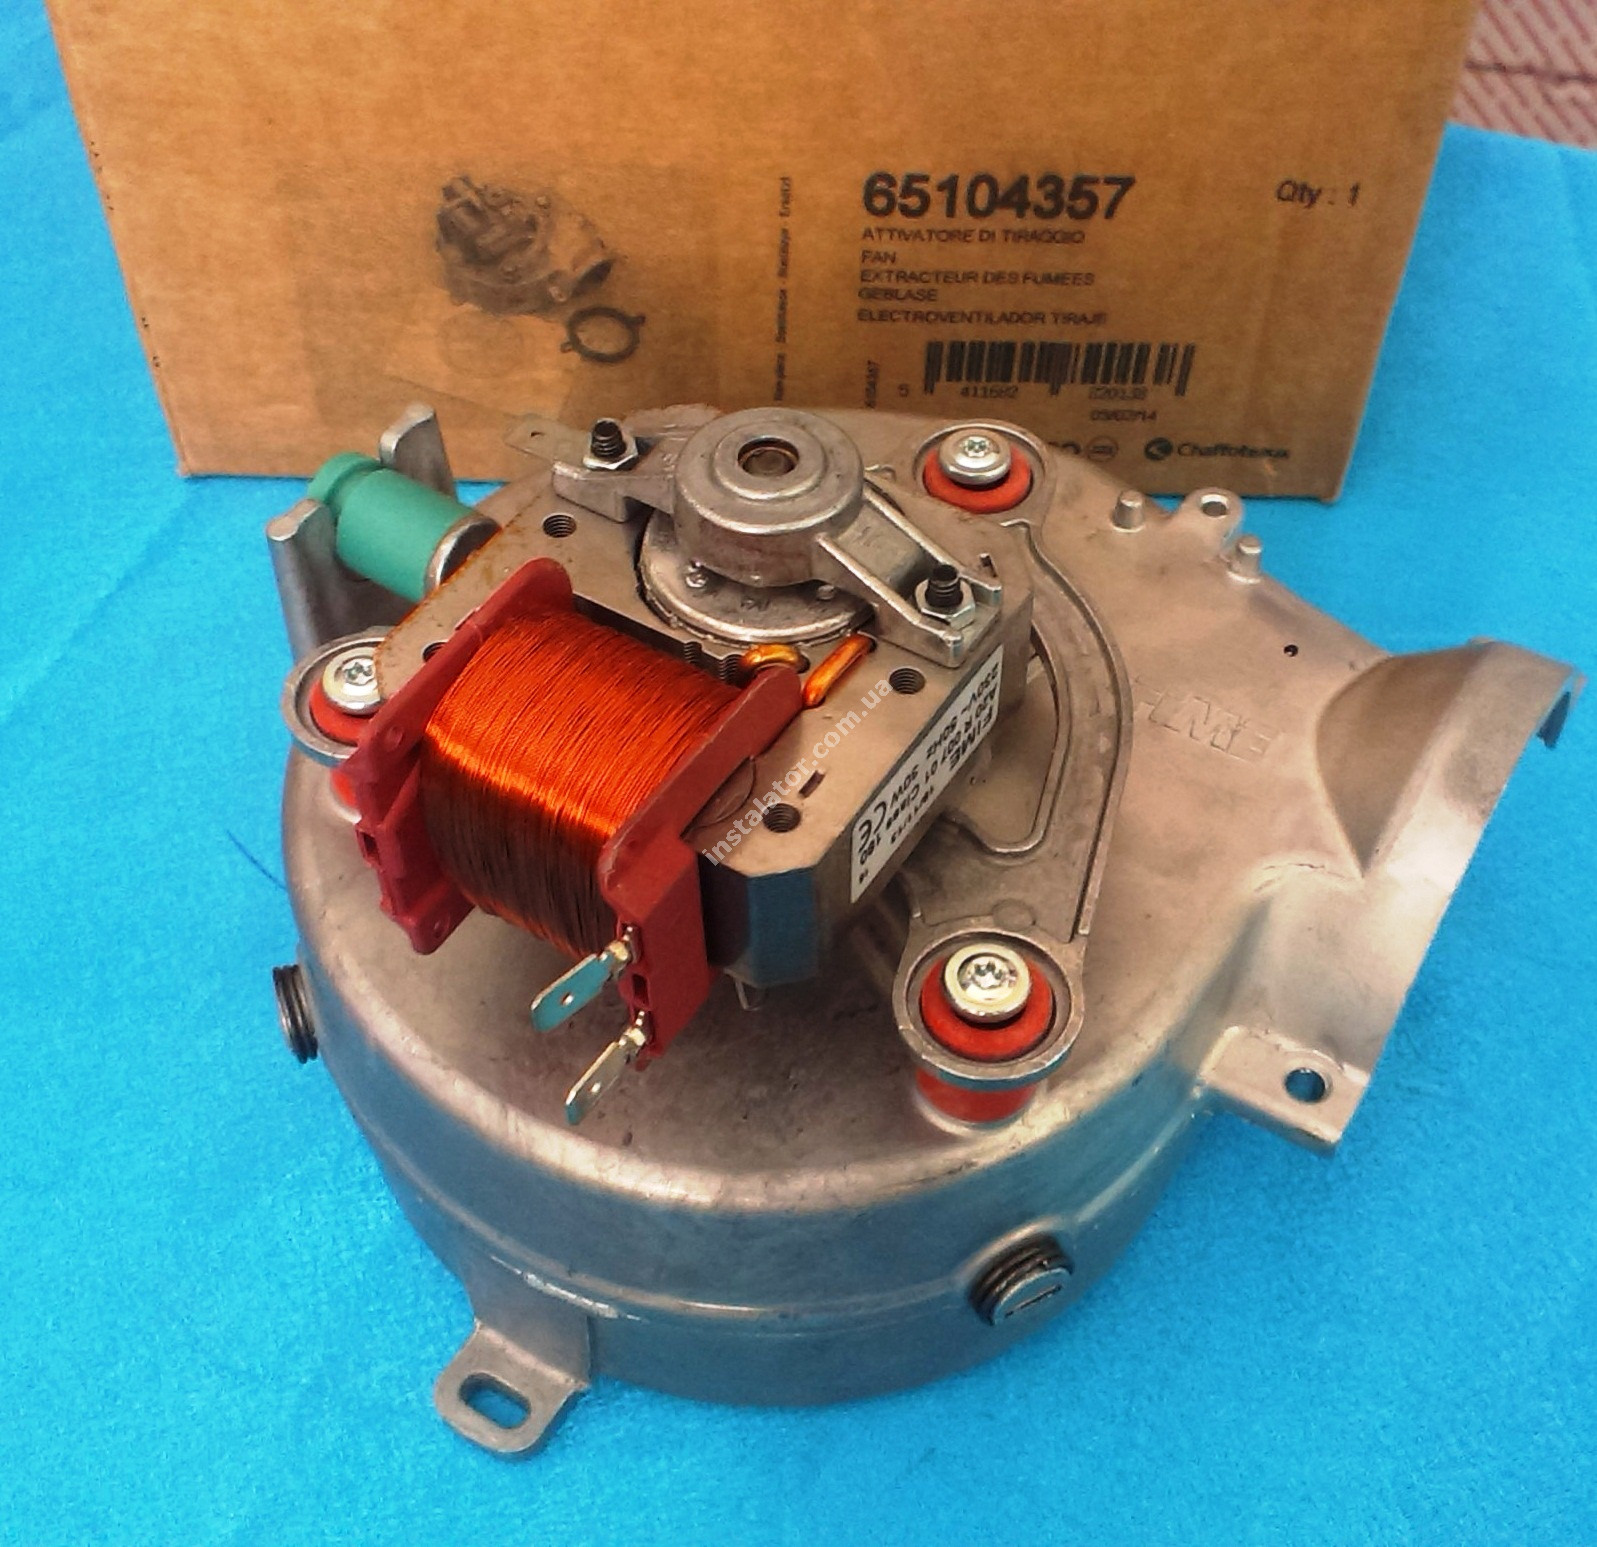 65104357  Турбіна (вентилятор) ARISTON EGIS, AS, BS, CLAS, CLAS SYSTEM full-image-0